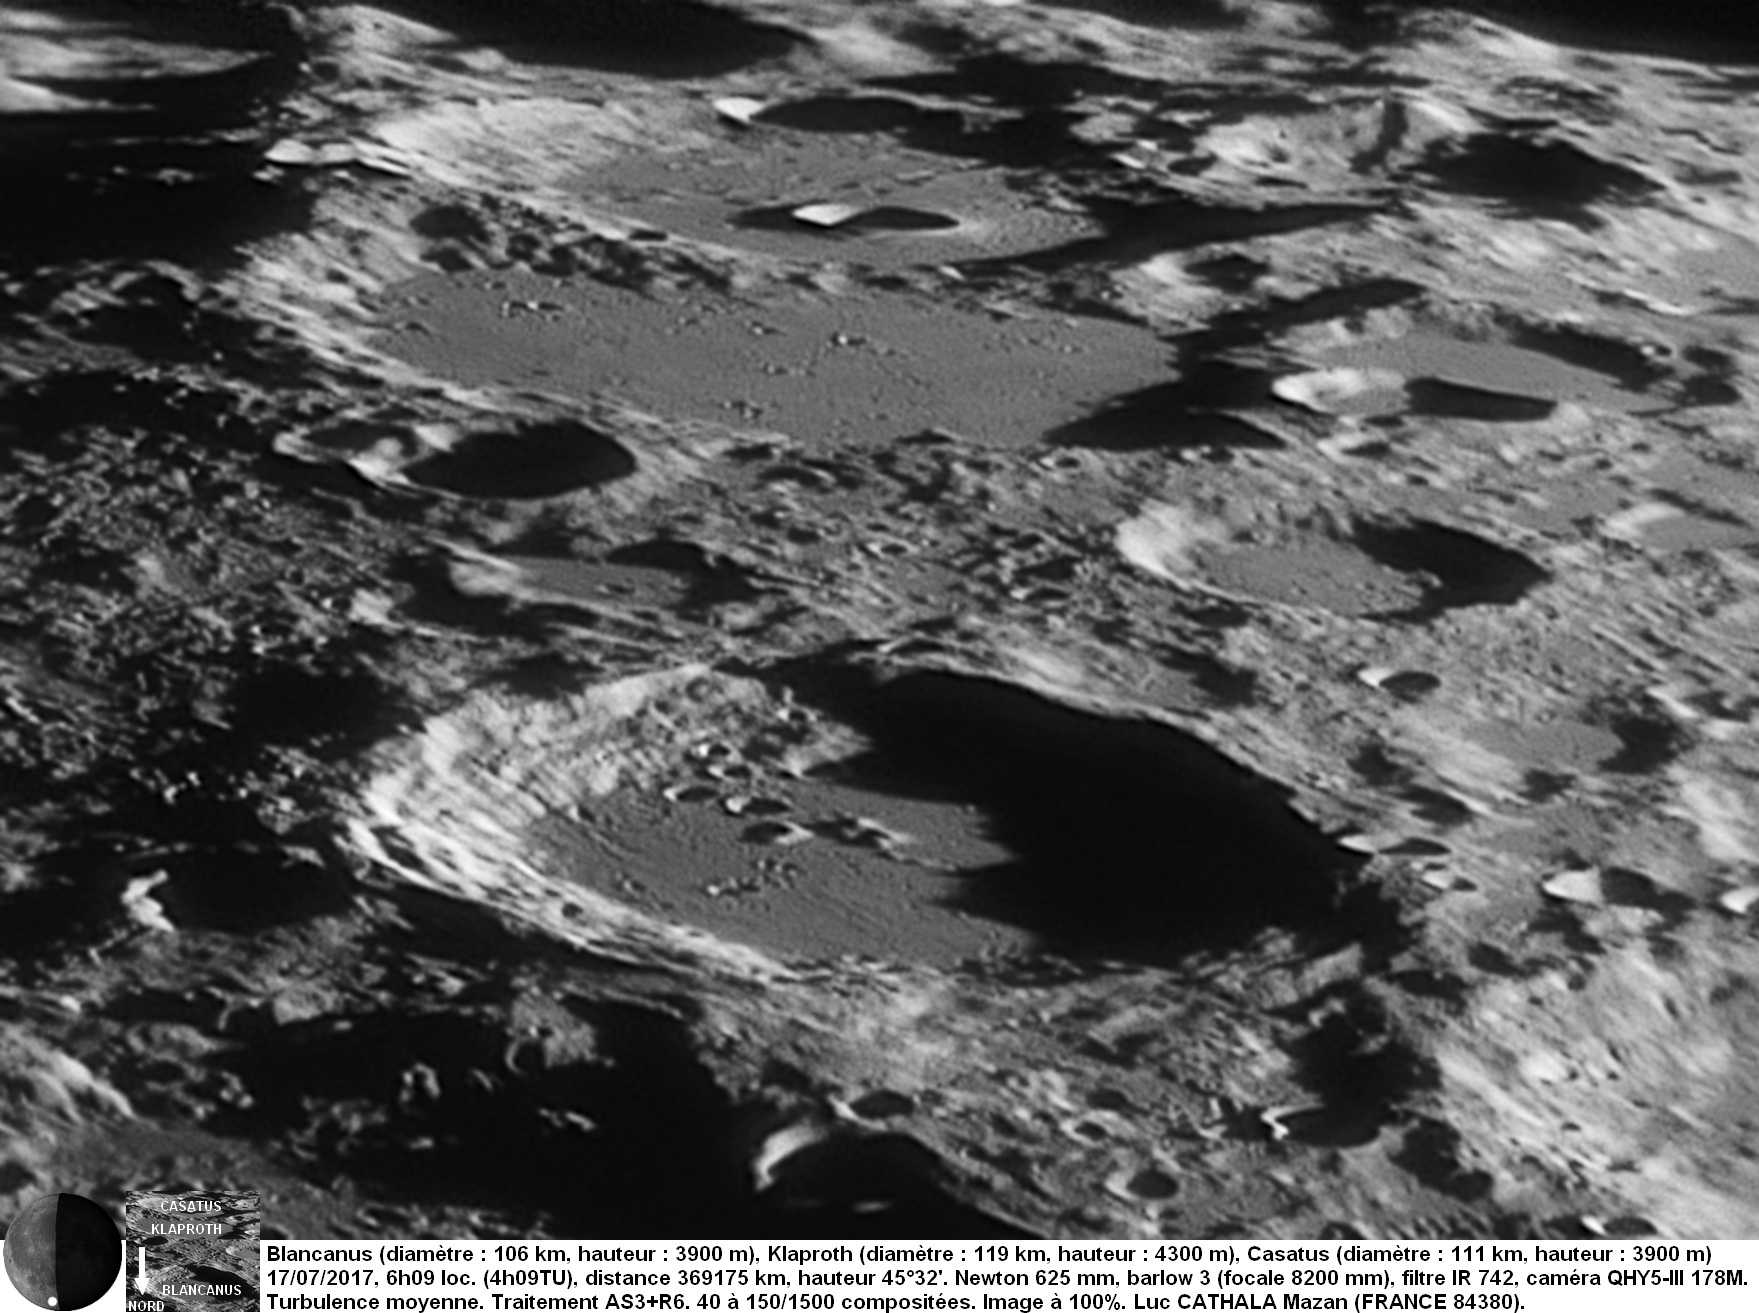 BLANCANUS KLAPROTH CASATUS 17072017 625 B3 742 06h09 625 mm barlow 3 filtre IR 742 QHY5-III 178M 100% Luc CATHALA.jpg